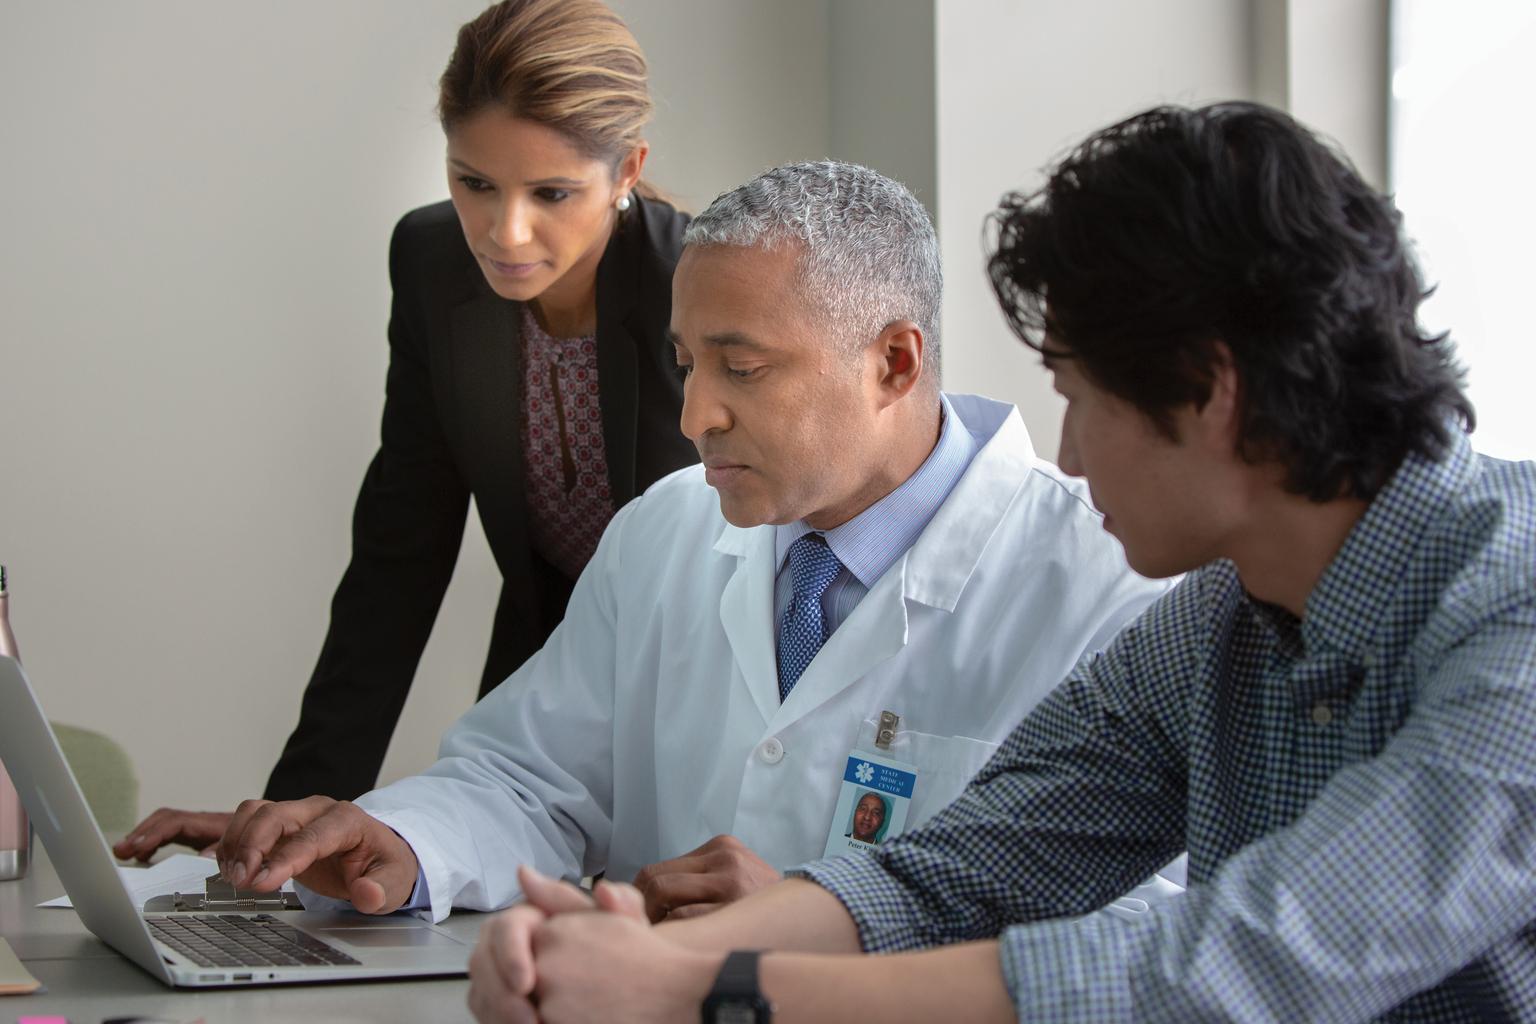 hospital staff veiwing laptop